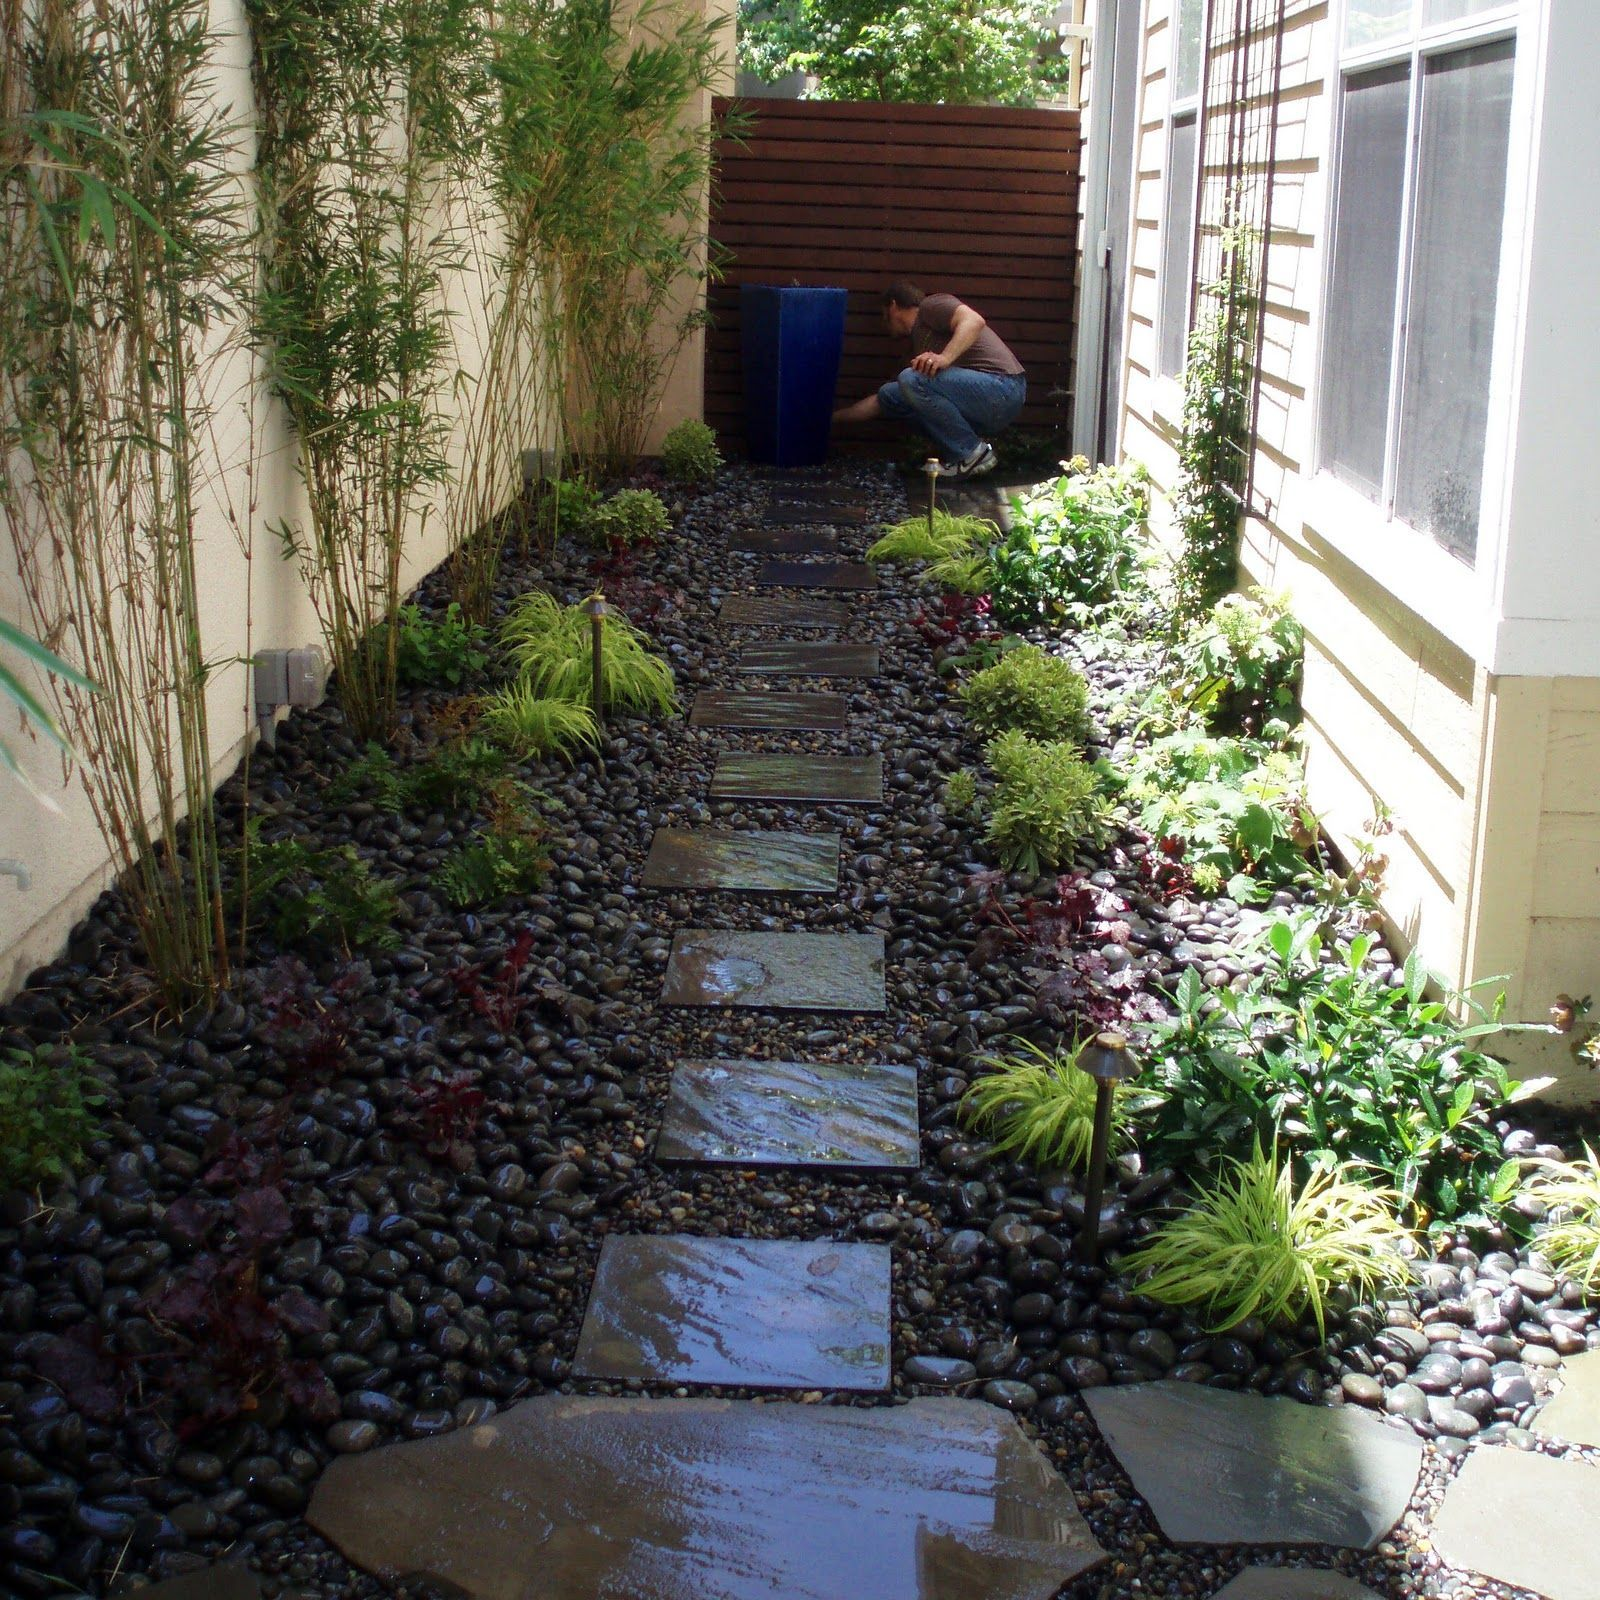 Landscaping Ideas For Long Narrow Backyards | Small ... on Narrow Yard Ideas  id=36070